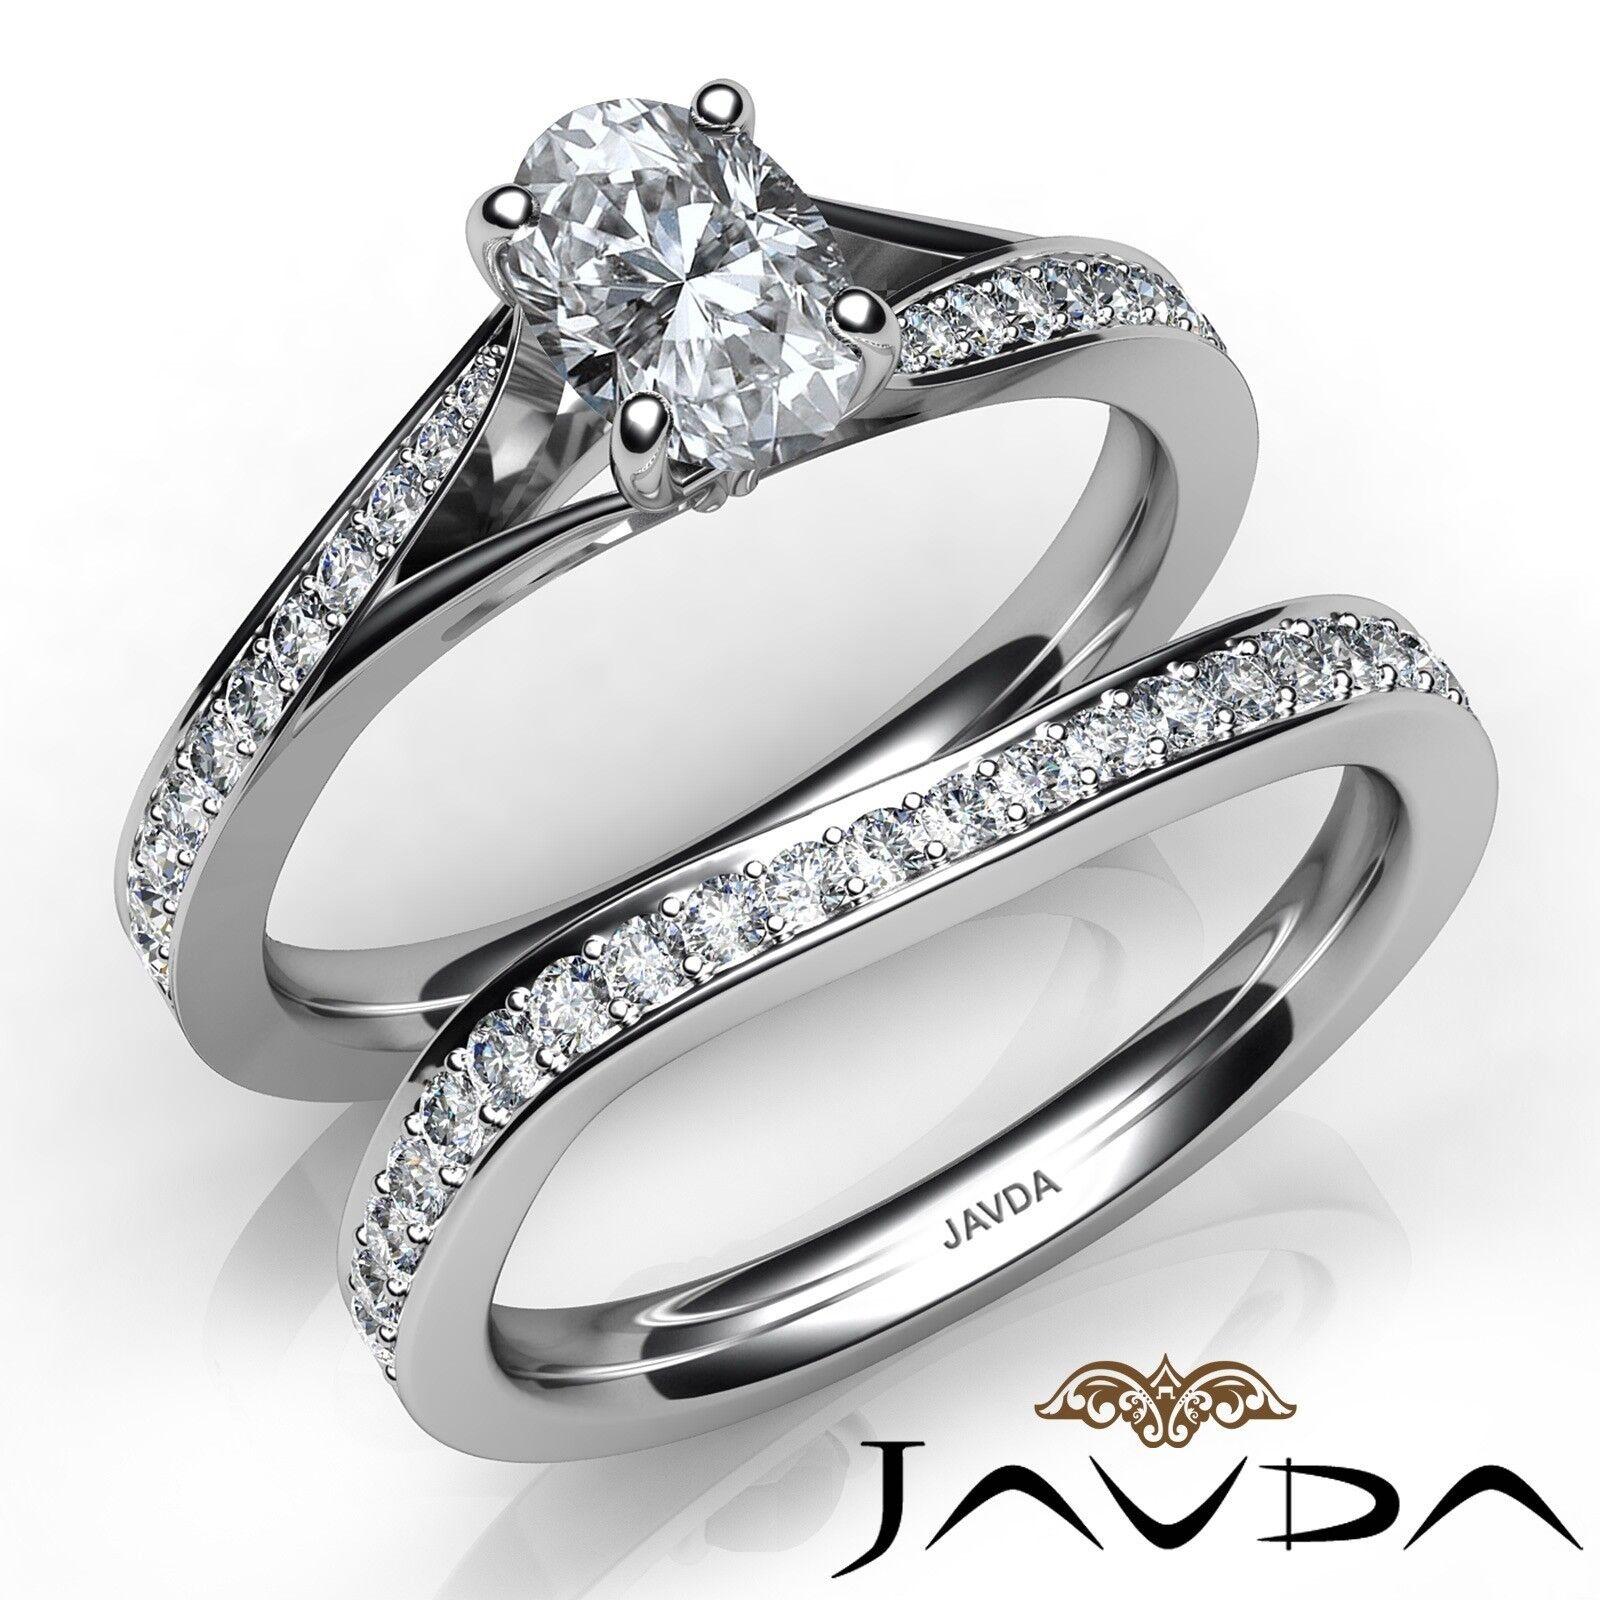 1.4ctw 4 Prong Bridal Set Pave Oval Diamond Engagement Ring GIA E-VS1 White Gold